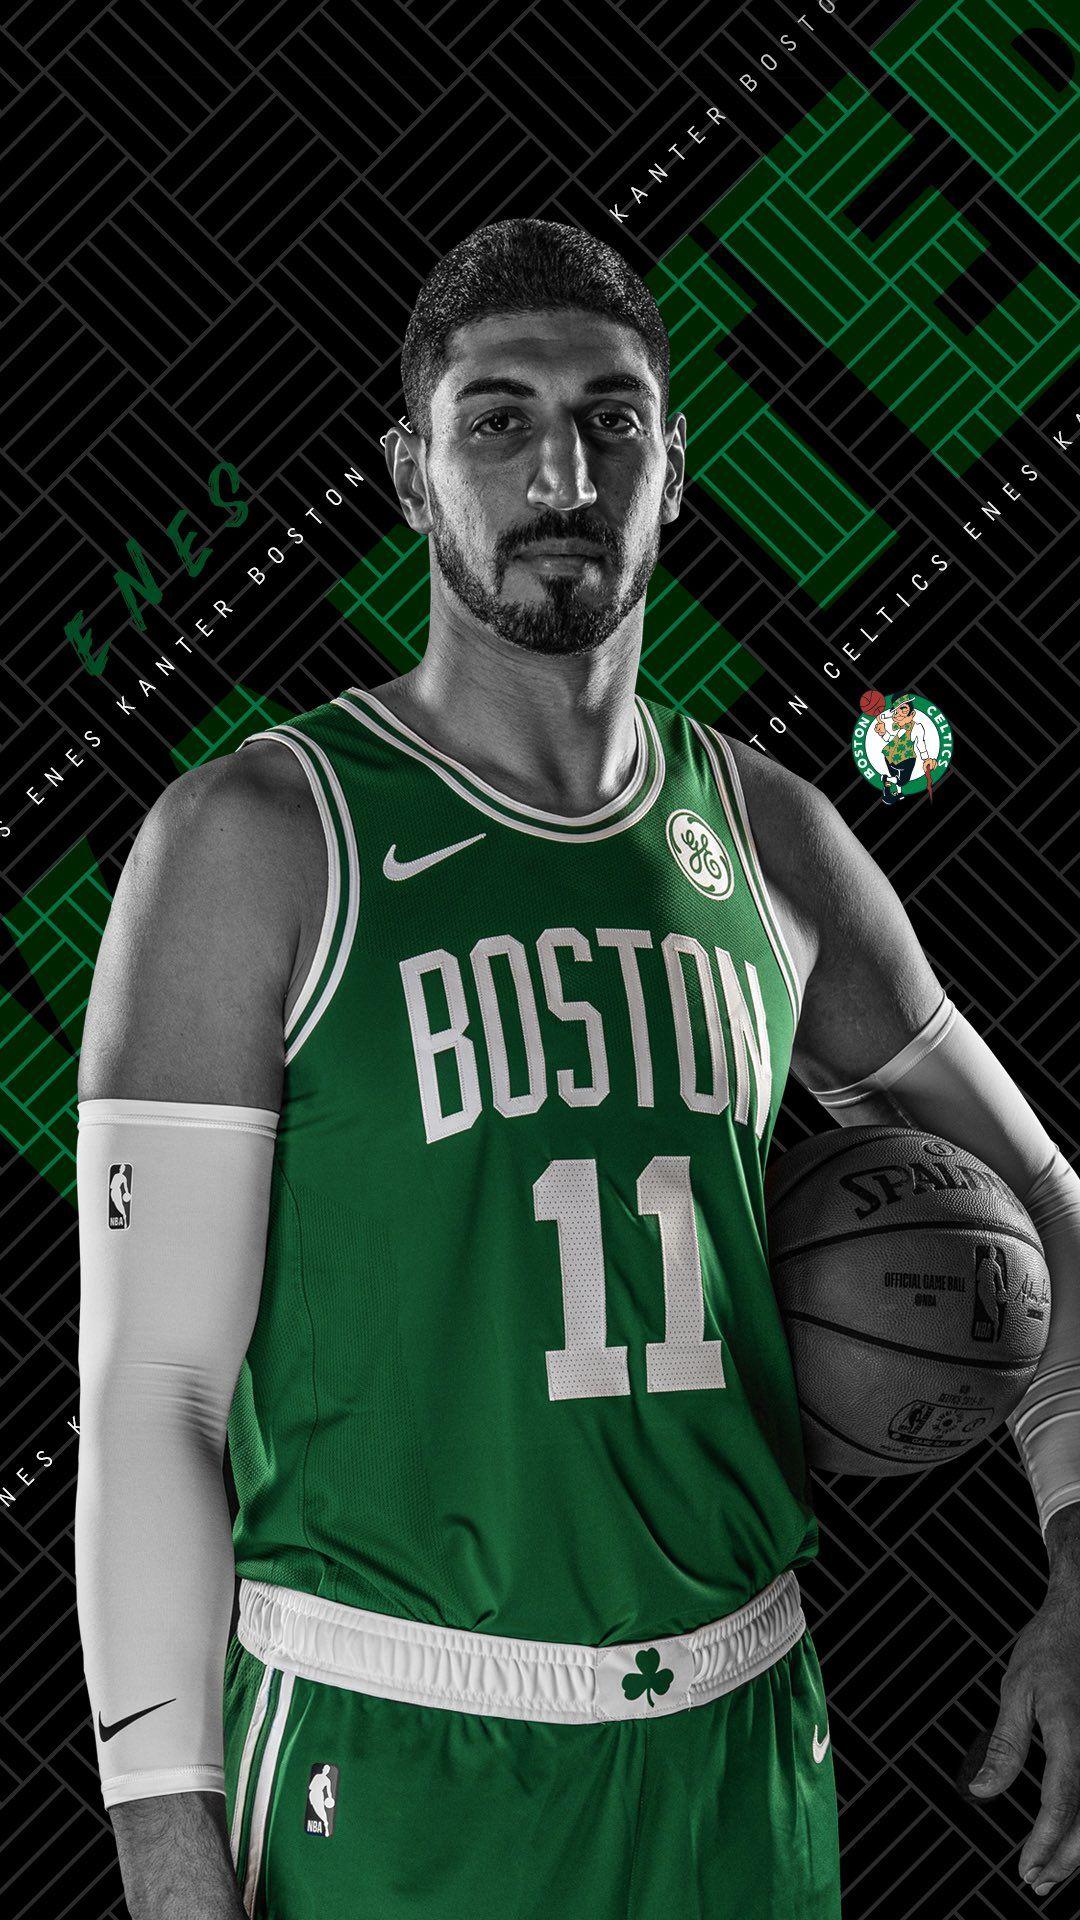 Boston Celtics On Twitter Celtic Boston Celtics Kemba Walker